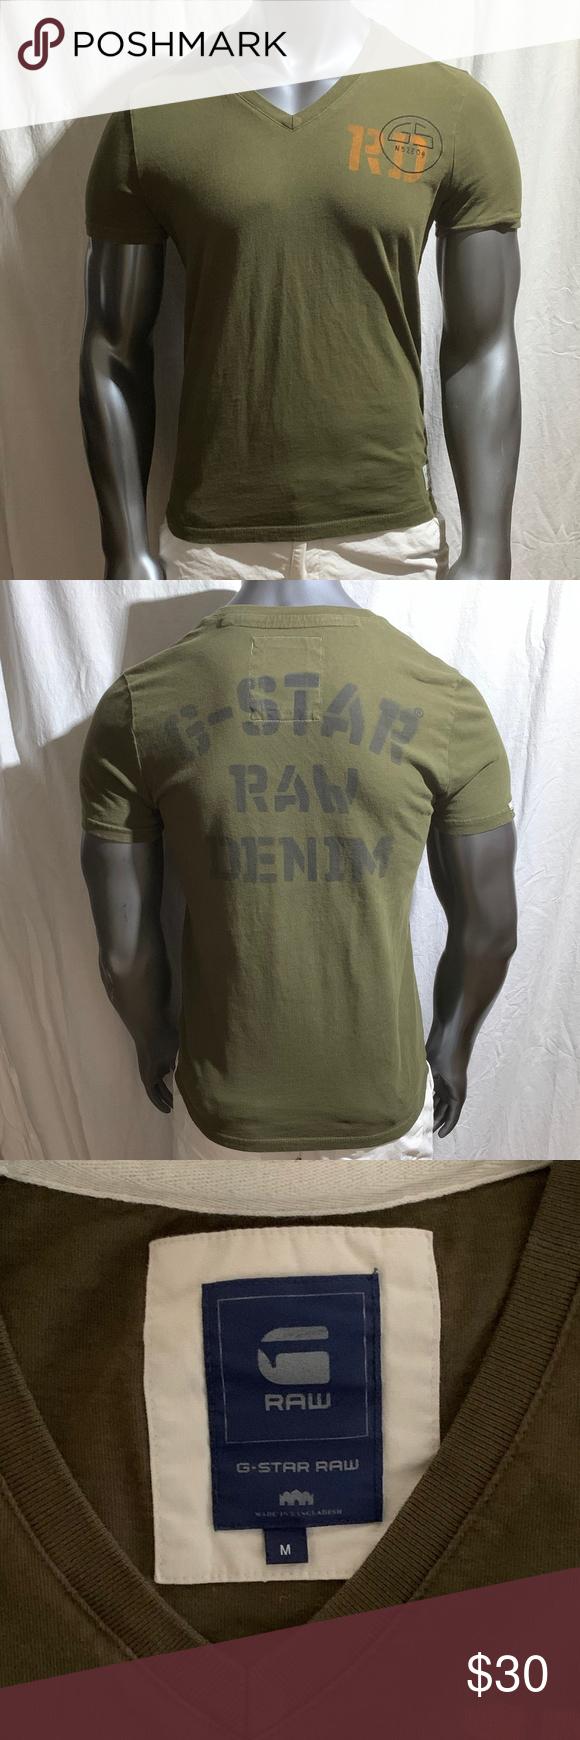 G Star Raw Logo T Shirt G Star Raw Short Sleeve Graphic T Shirt Great Color Scheme G Star Shirts Tees Short Sleeve G Star Raw Shorts Shirts Tshirt Logo